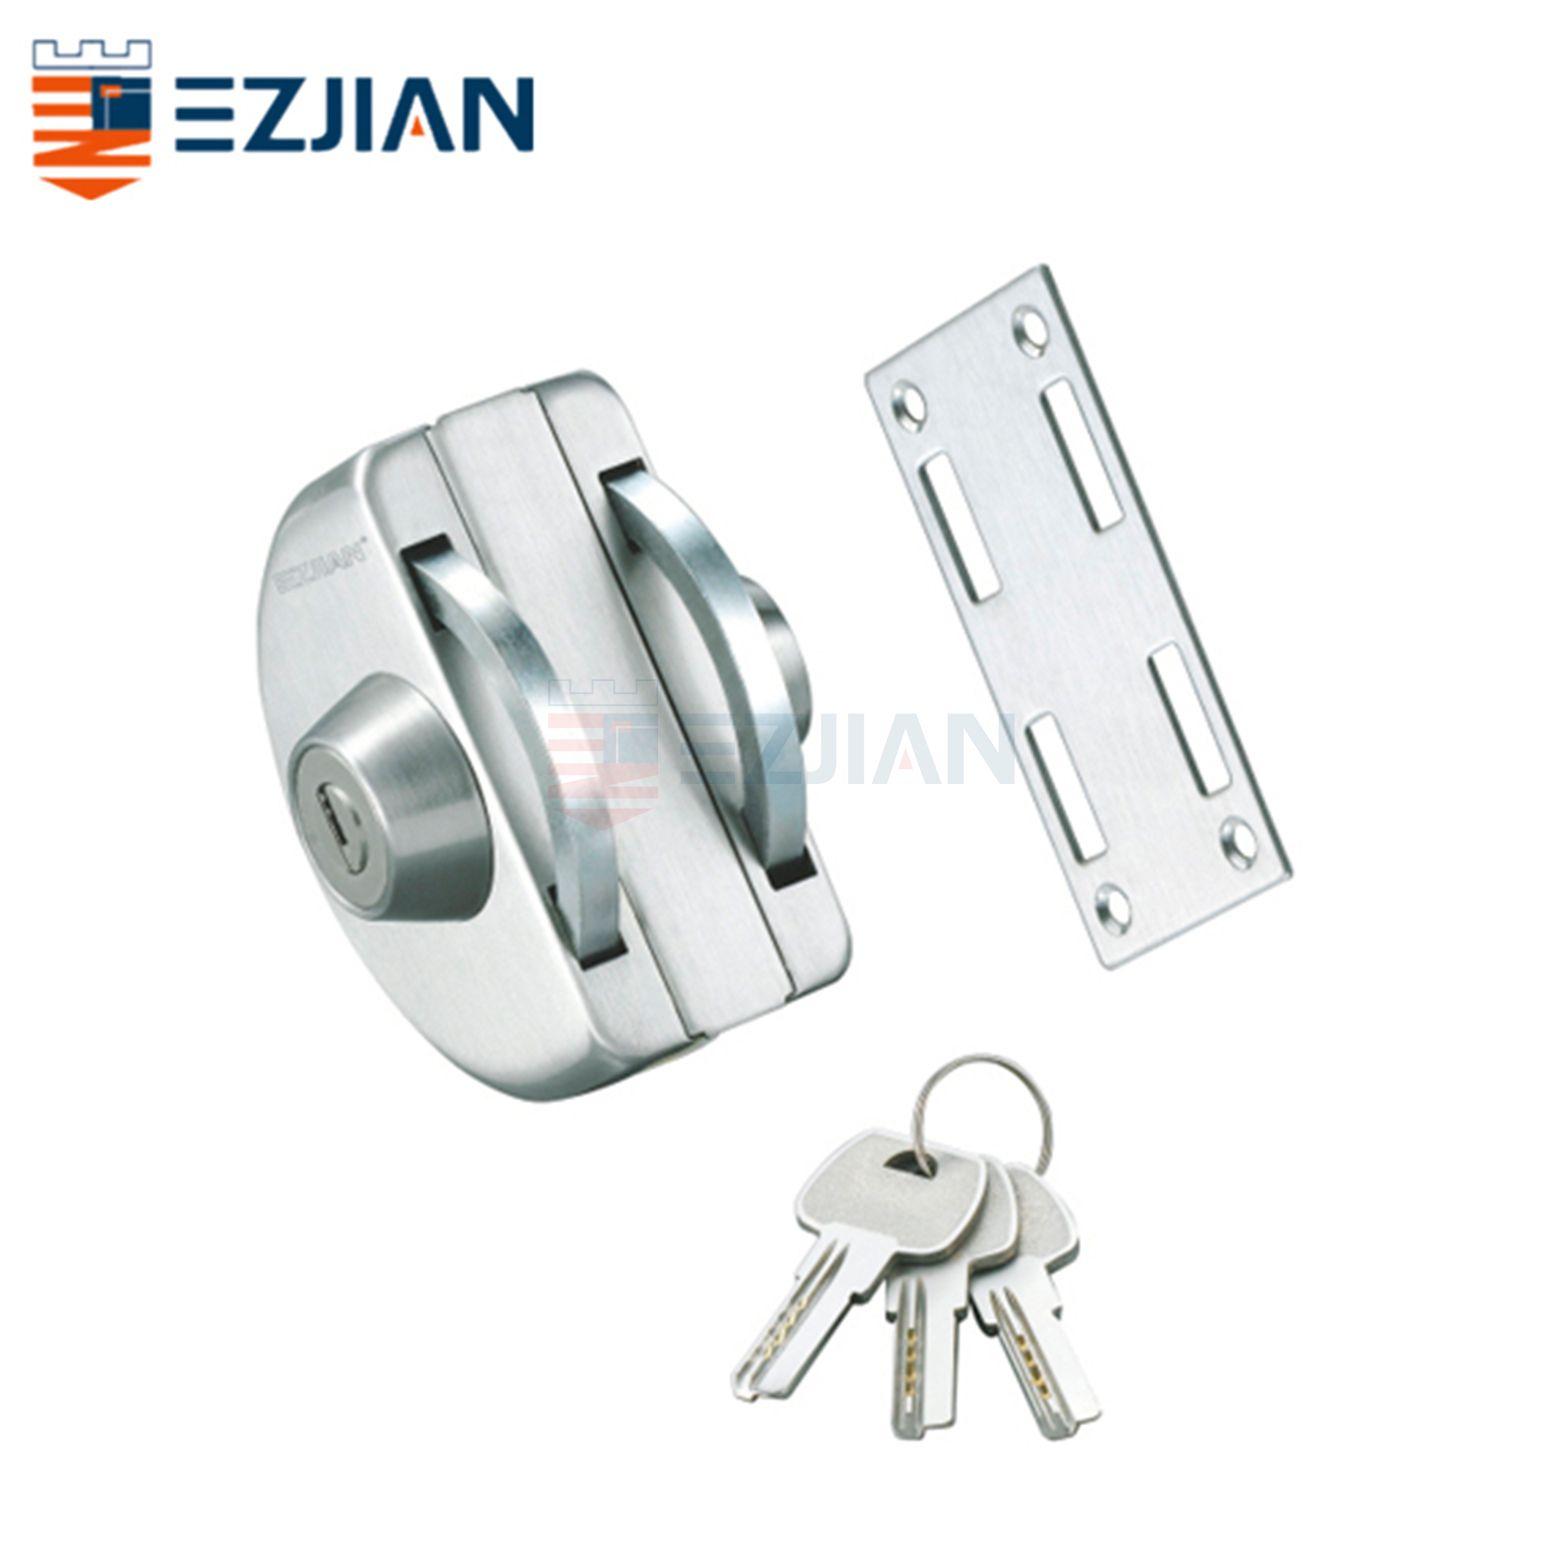 Glass Gate Lock EJ-9013